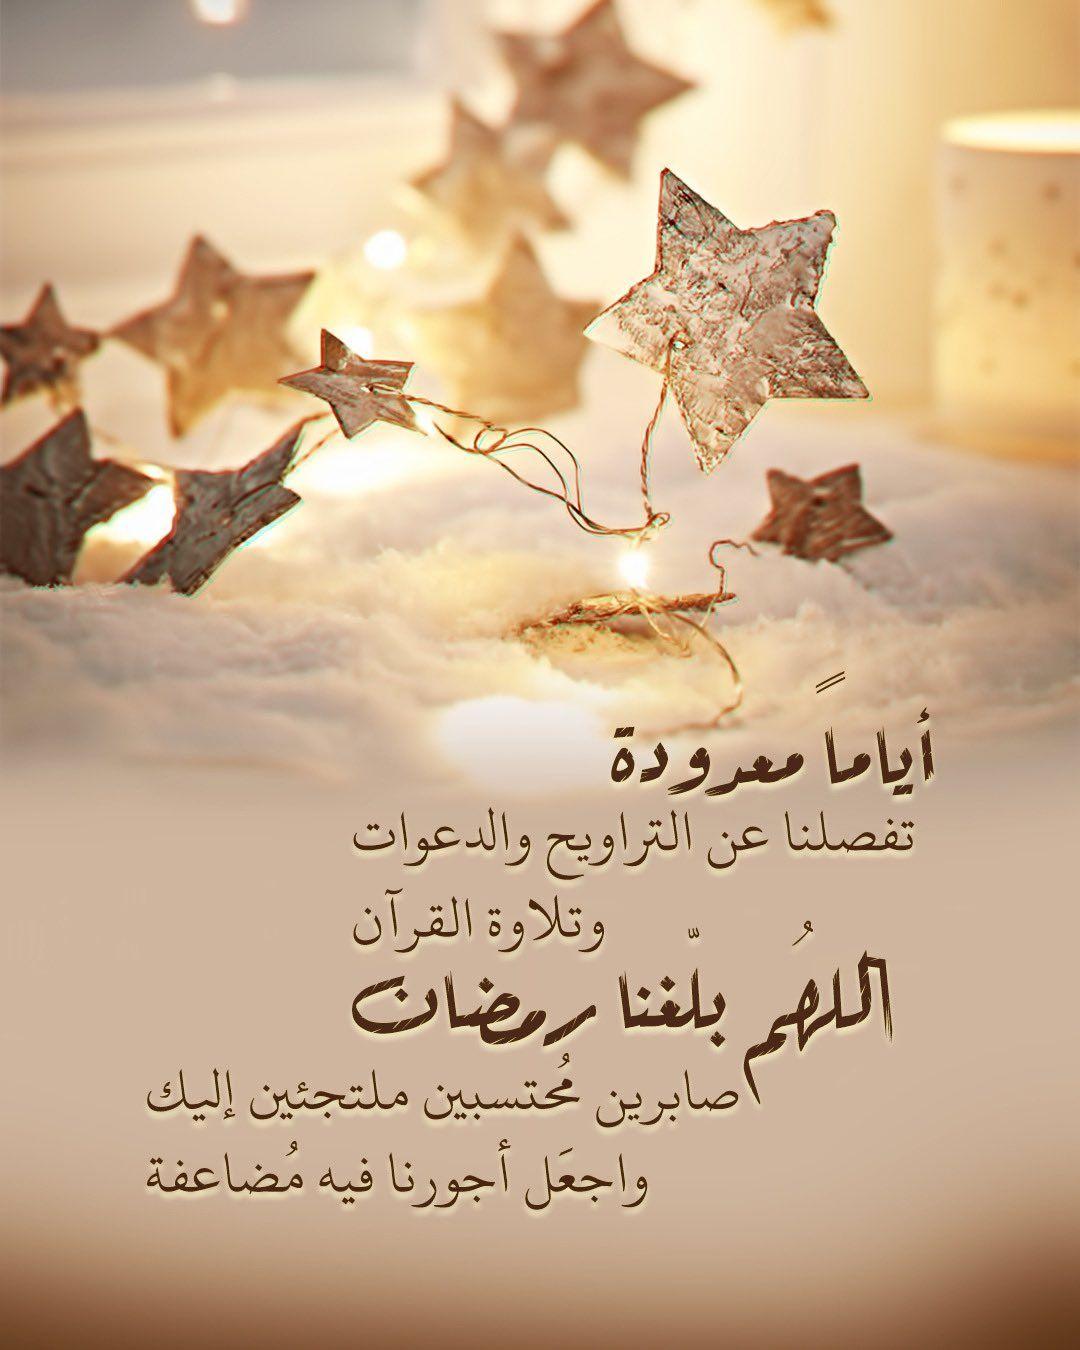 Pin By Samt On بطـاقـات صبـاحيـة واسـلاميـة 2 Ramadan Decorations Ramadan Mubarak Wallpapers Ramadan Kareem